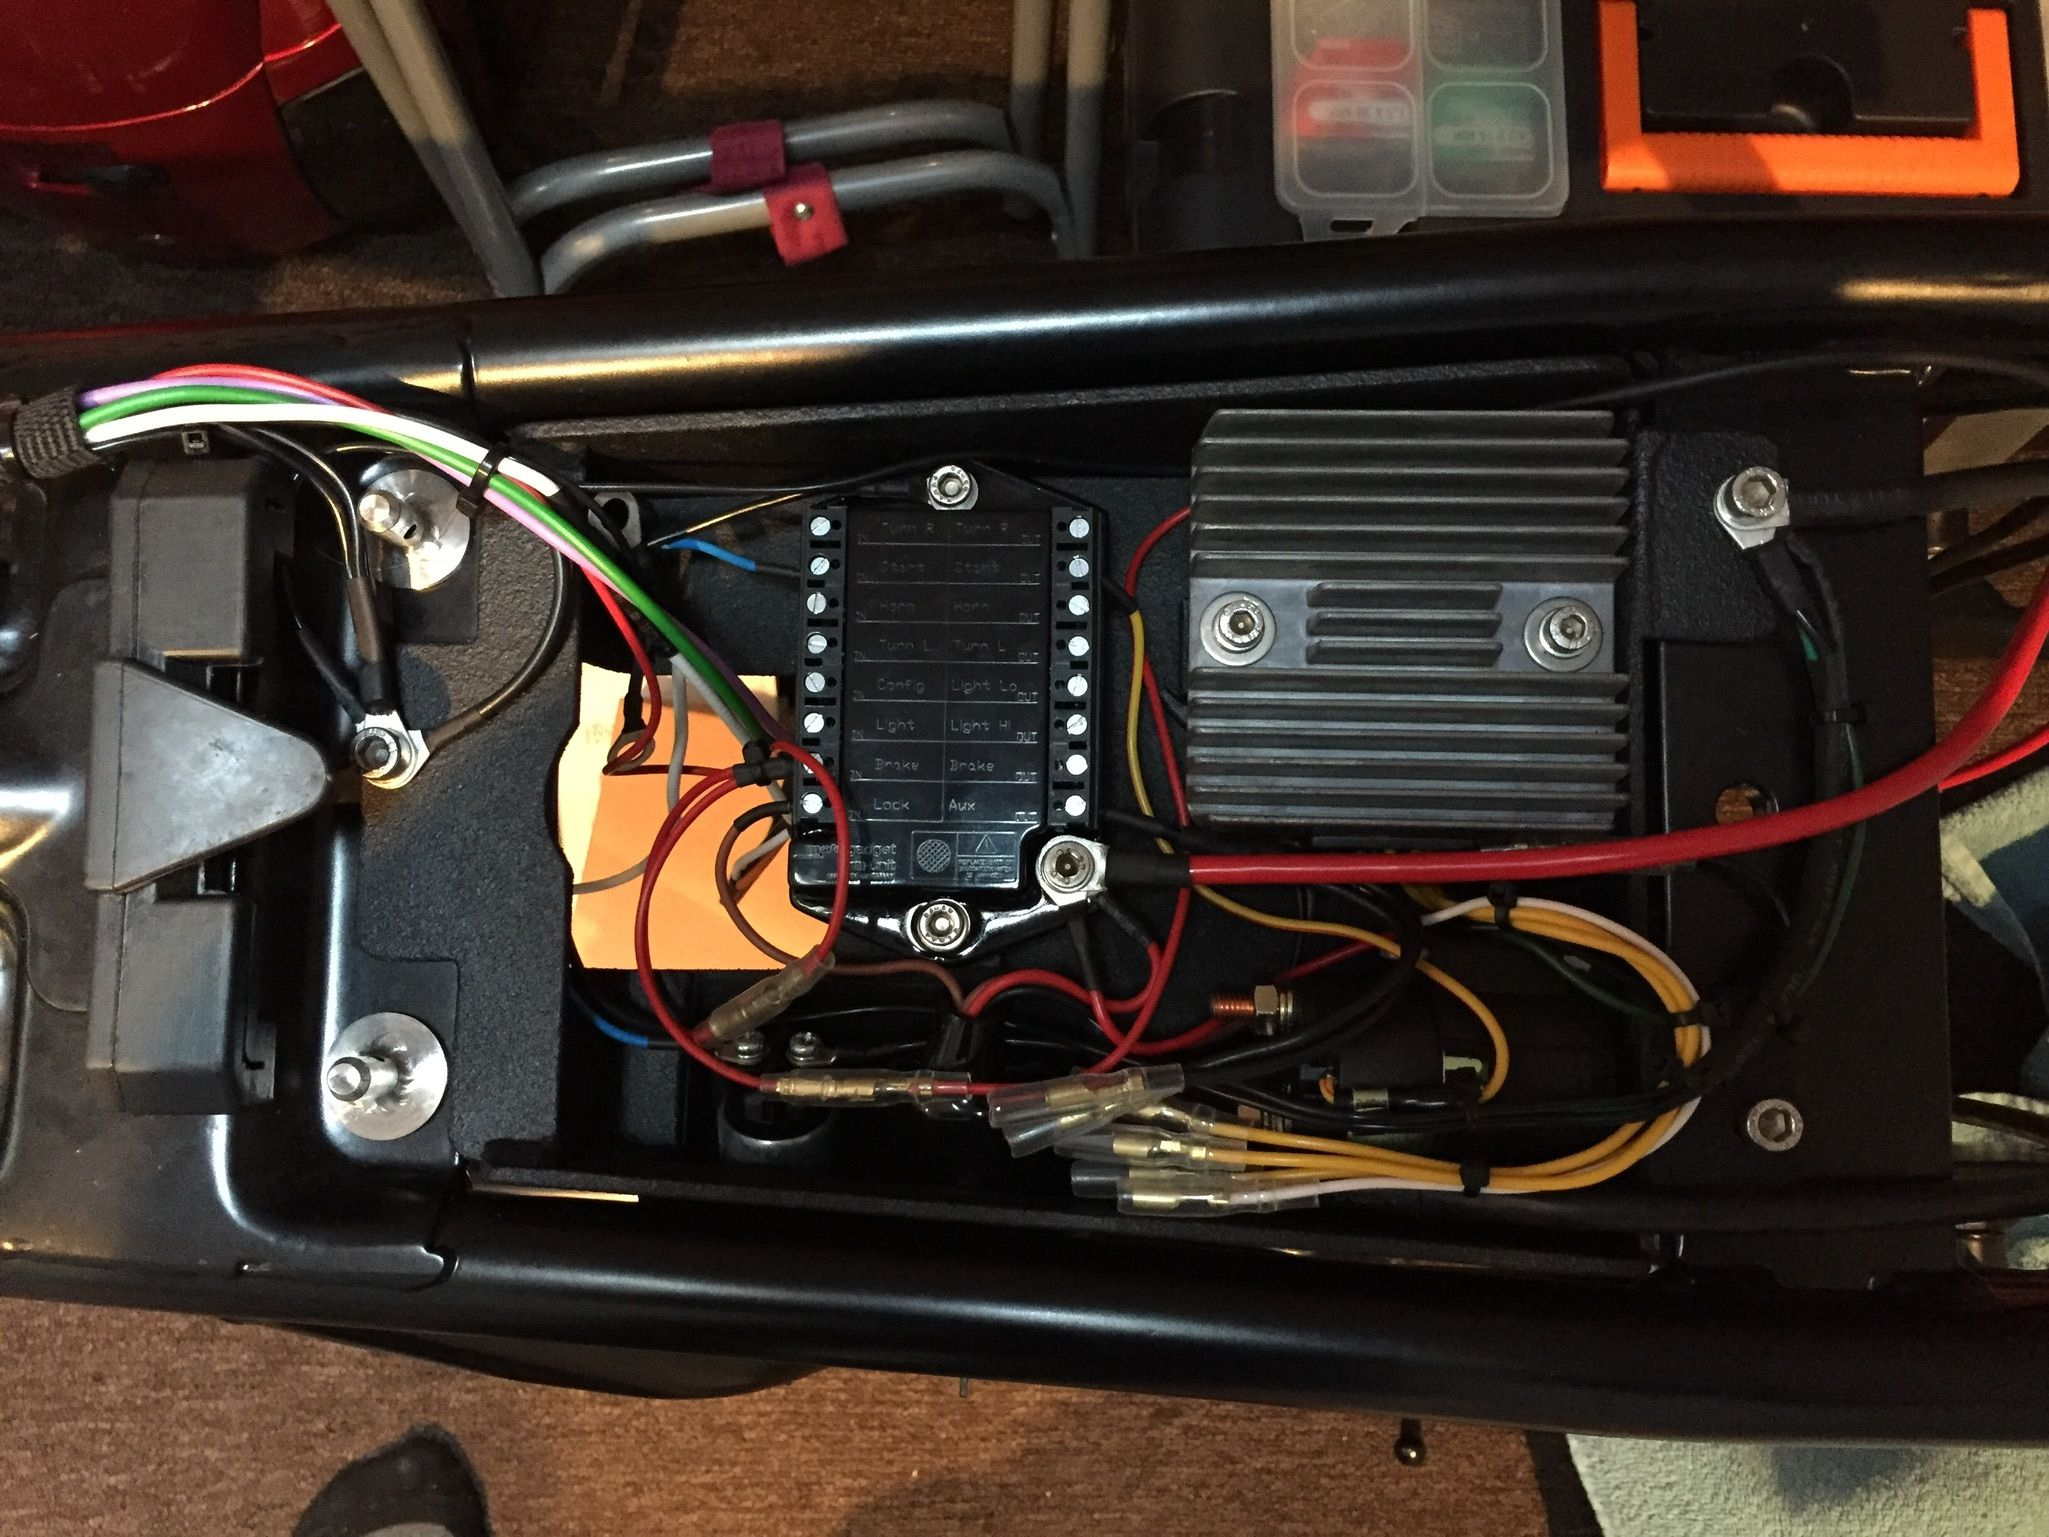 medium resolution of wiring the bike with the m unit from motogadget kawasaki z1000 cb750 street